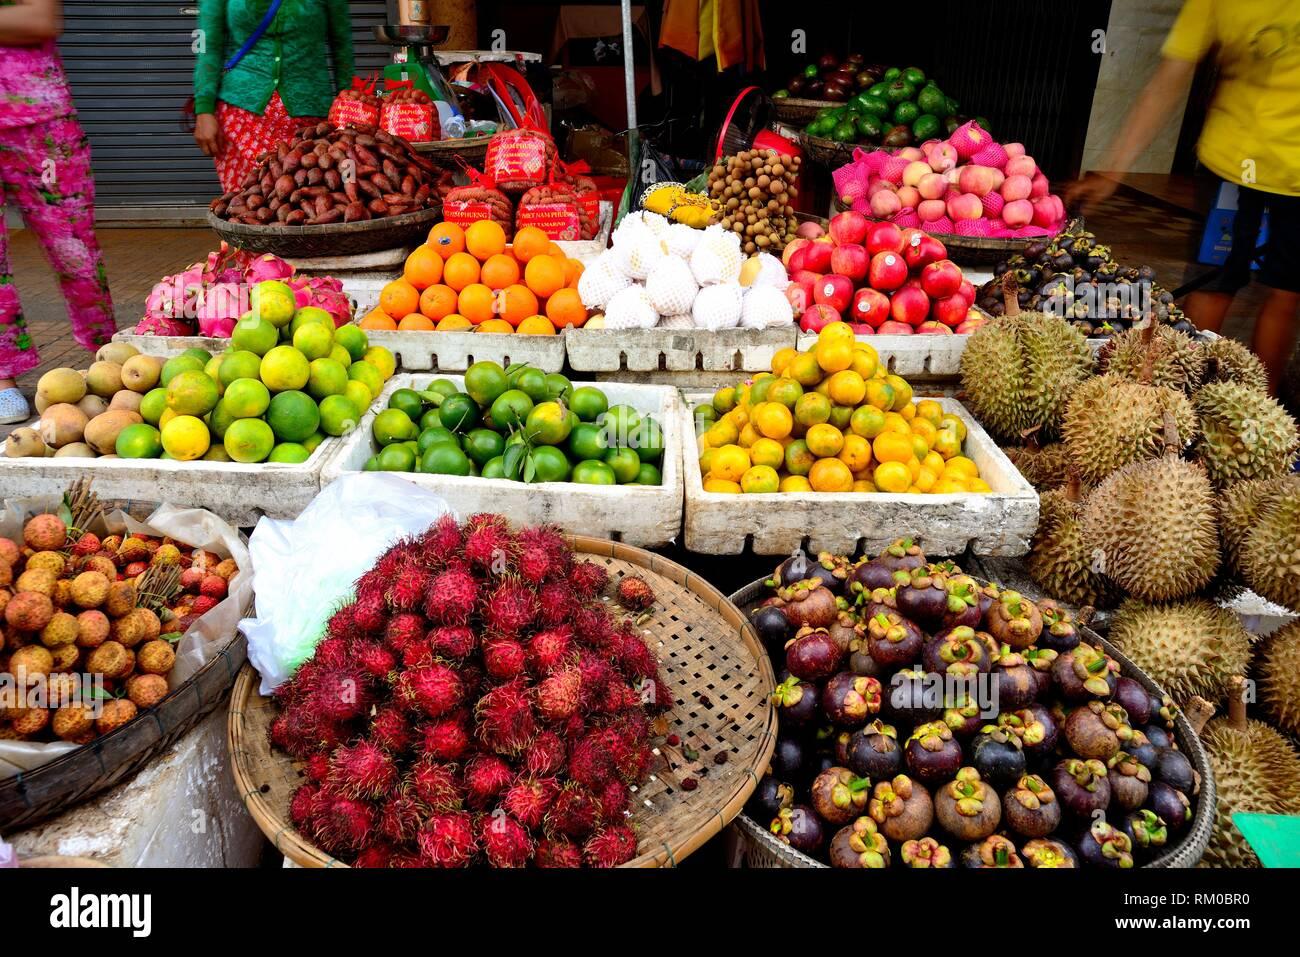 Fruit stand in Preah Sihanouk street. Street Market (Psar) of Kratie, Cambodia Stock Photo